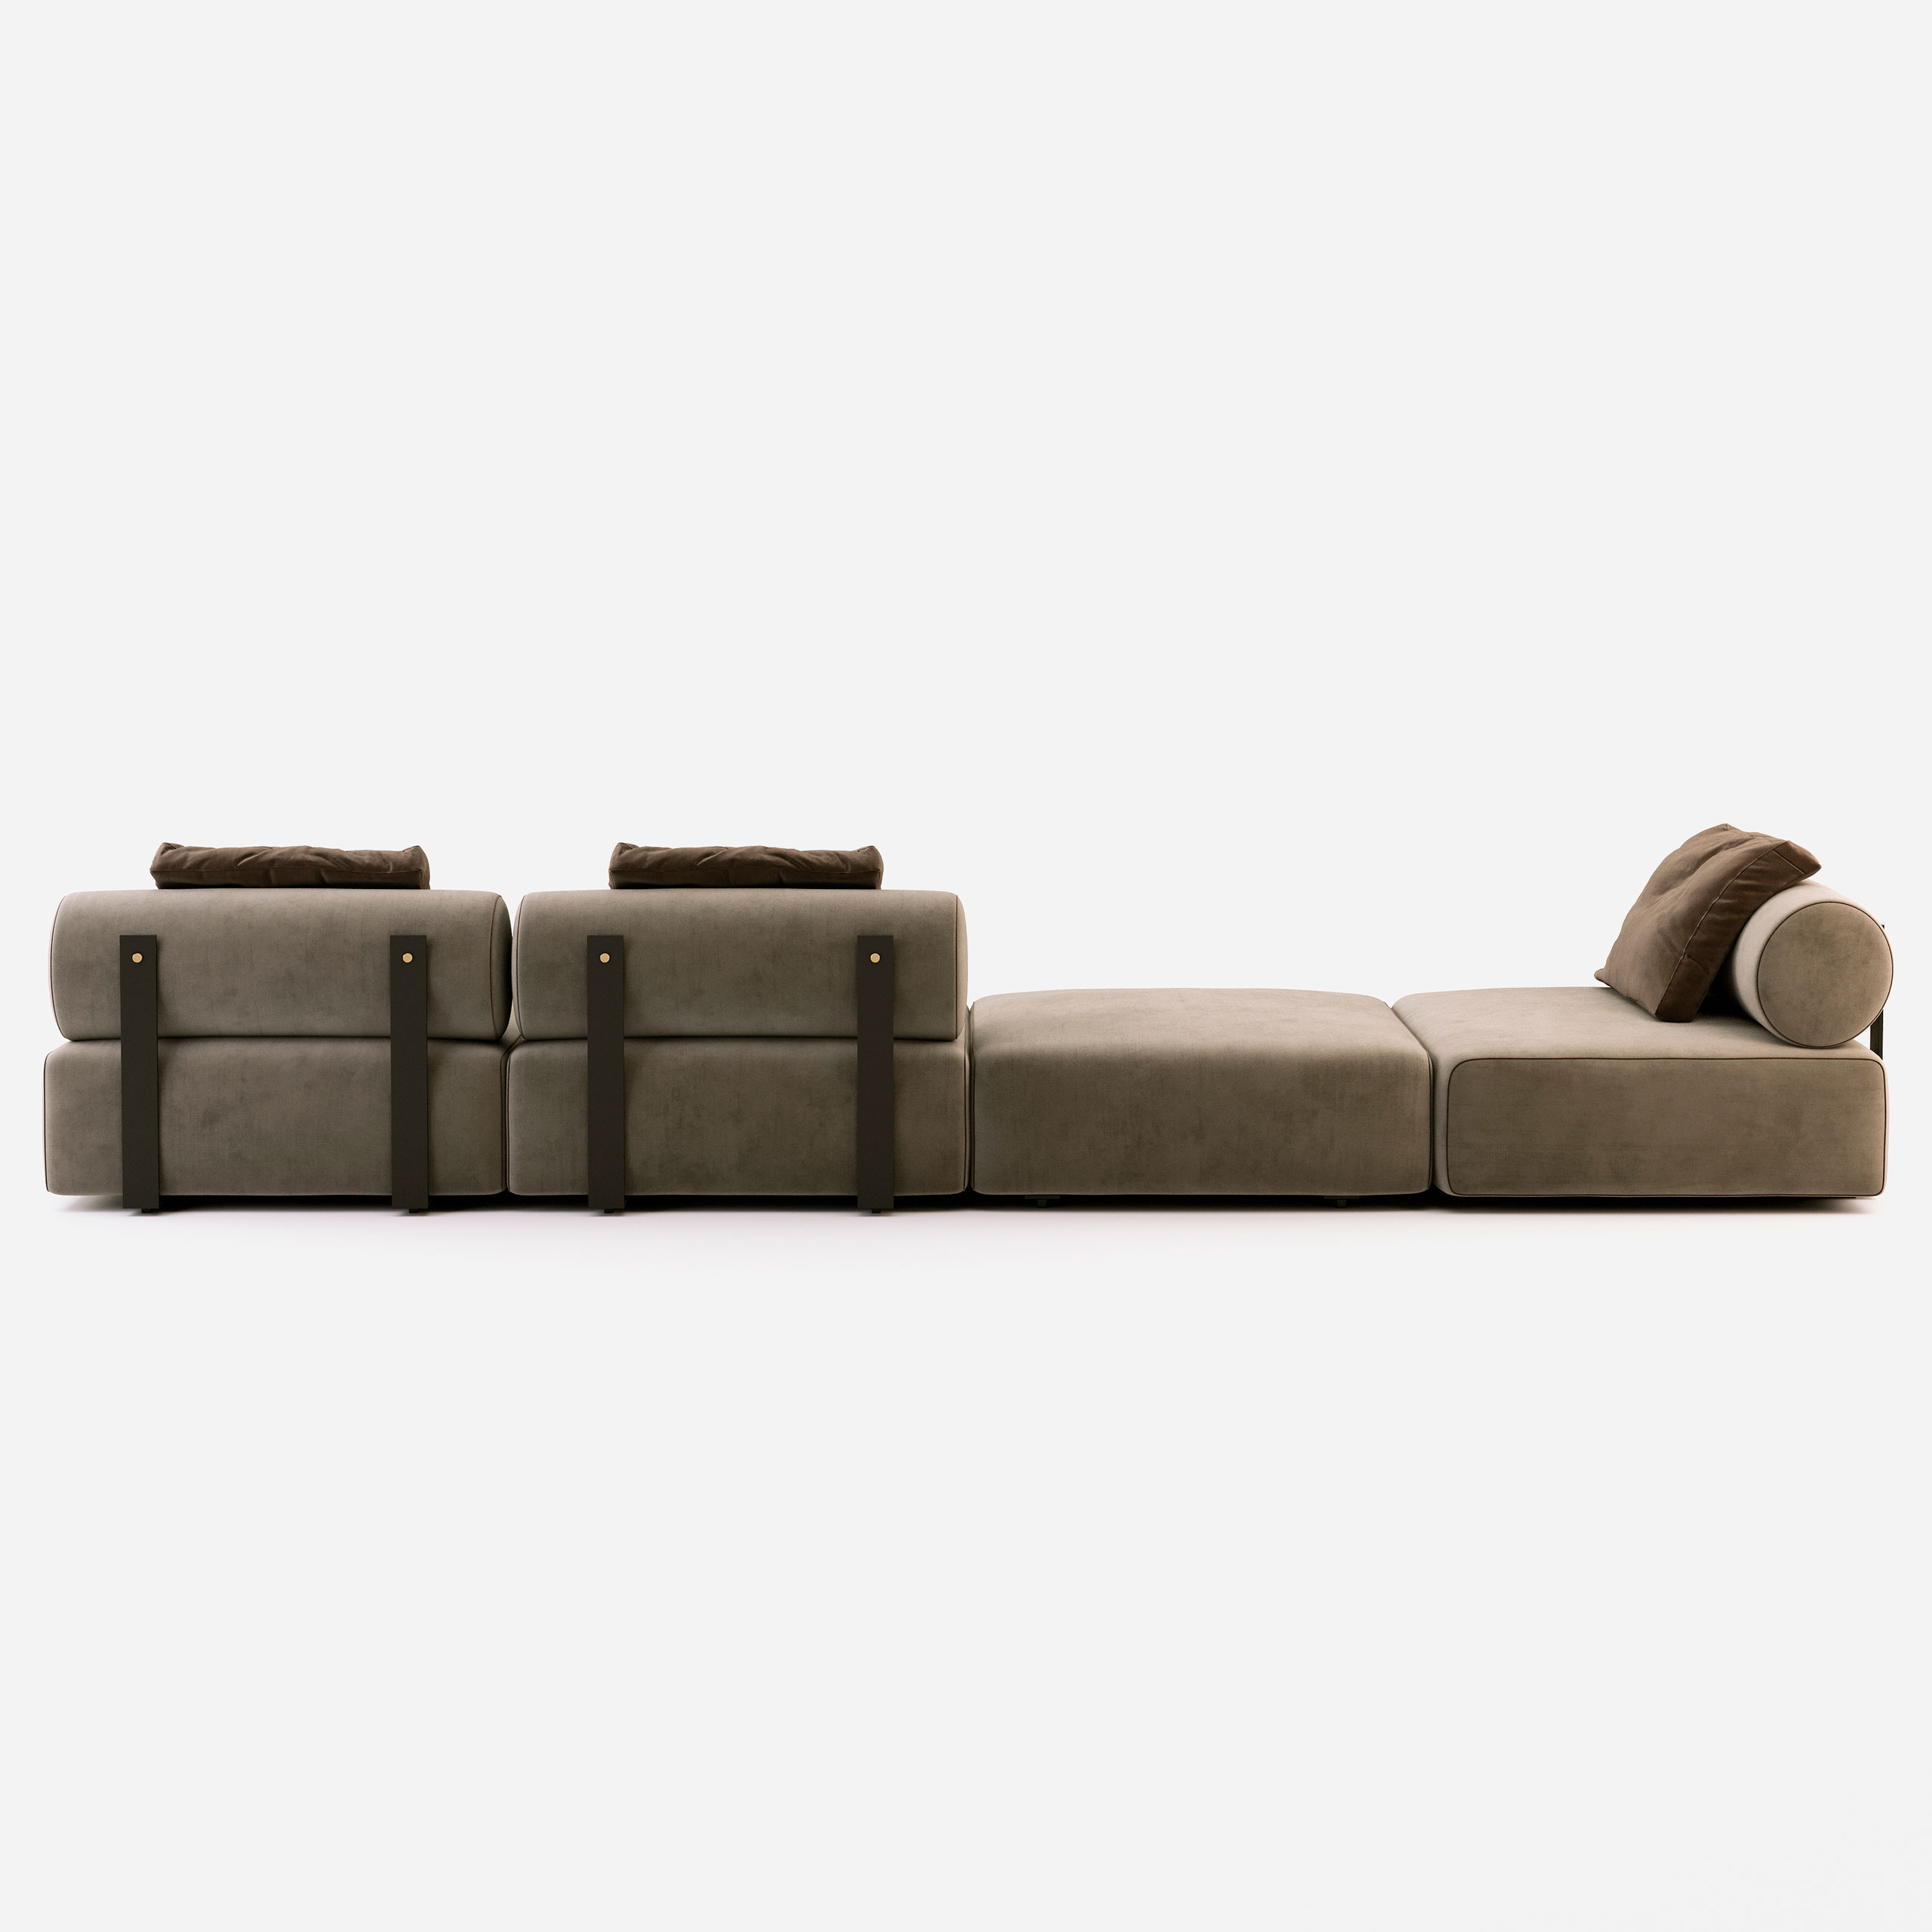 shinto-sofa-domkapa-new-collection-2021-living-room-decor